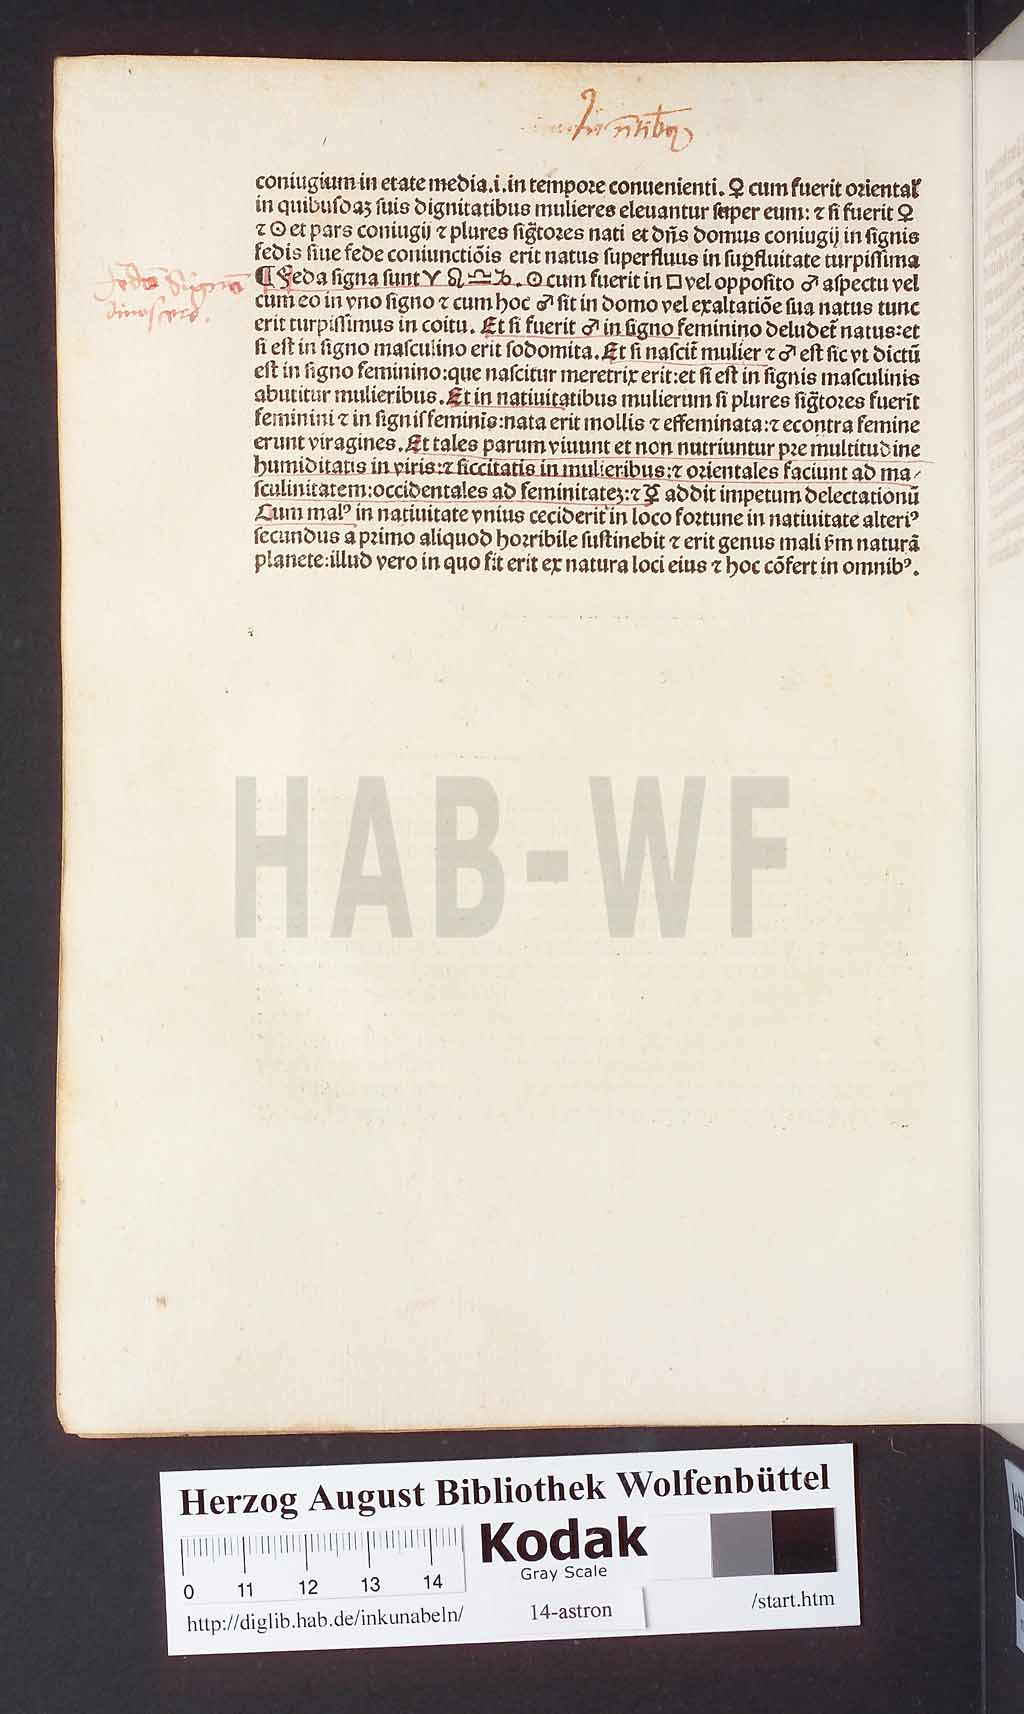 http://diglib.hab.de/inkunabeln/14-astron/00128.jpg